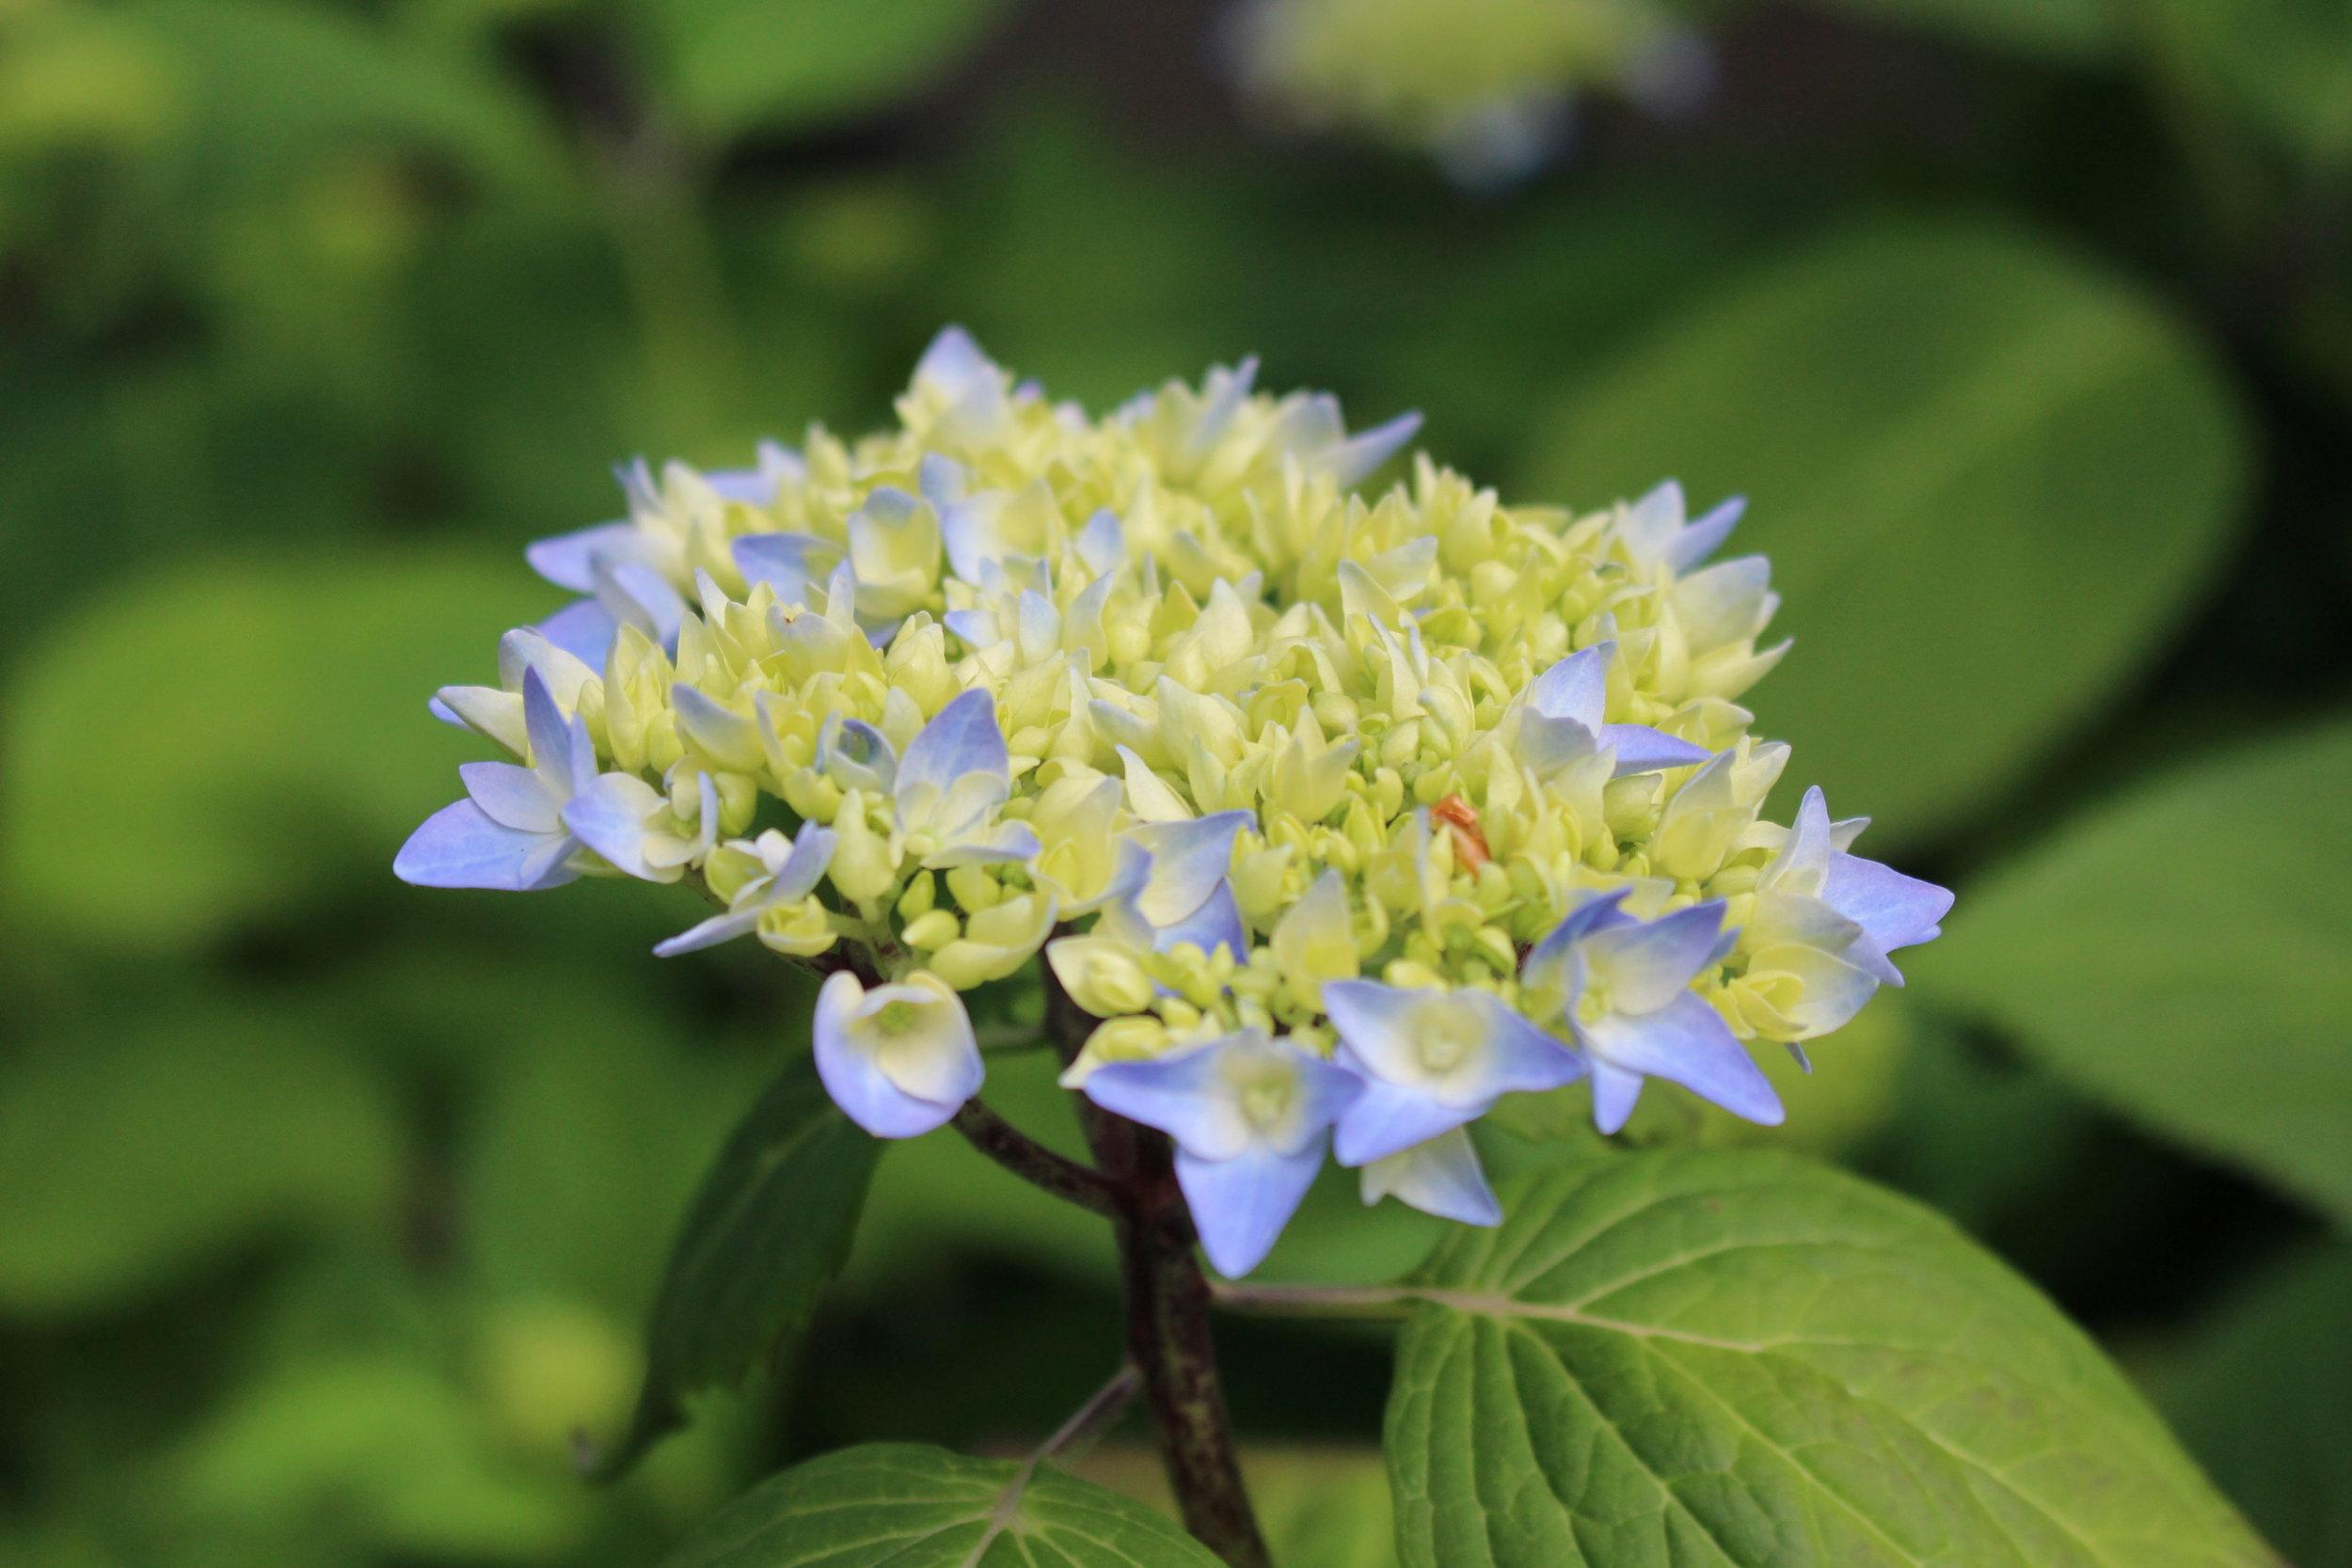 #46 Hydrangea, Hydrangea macrophylla